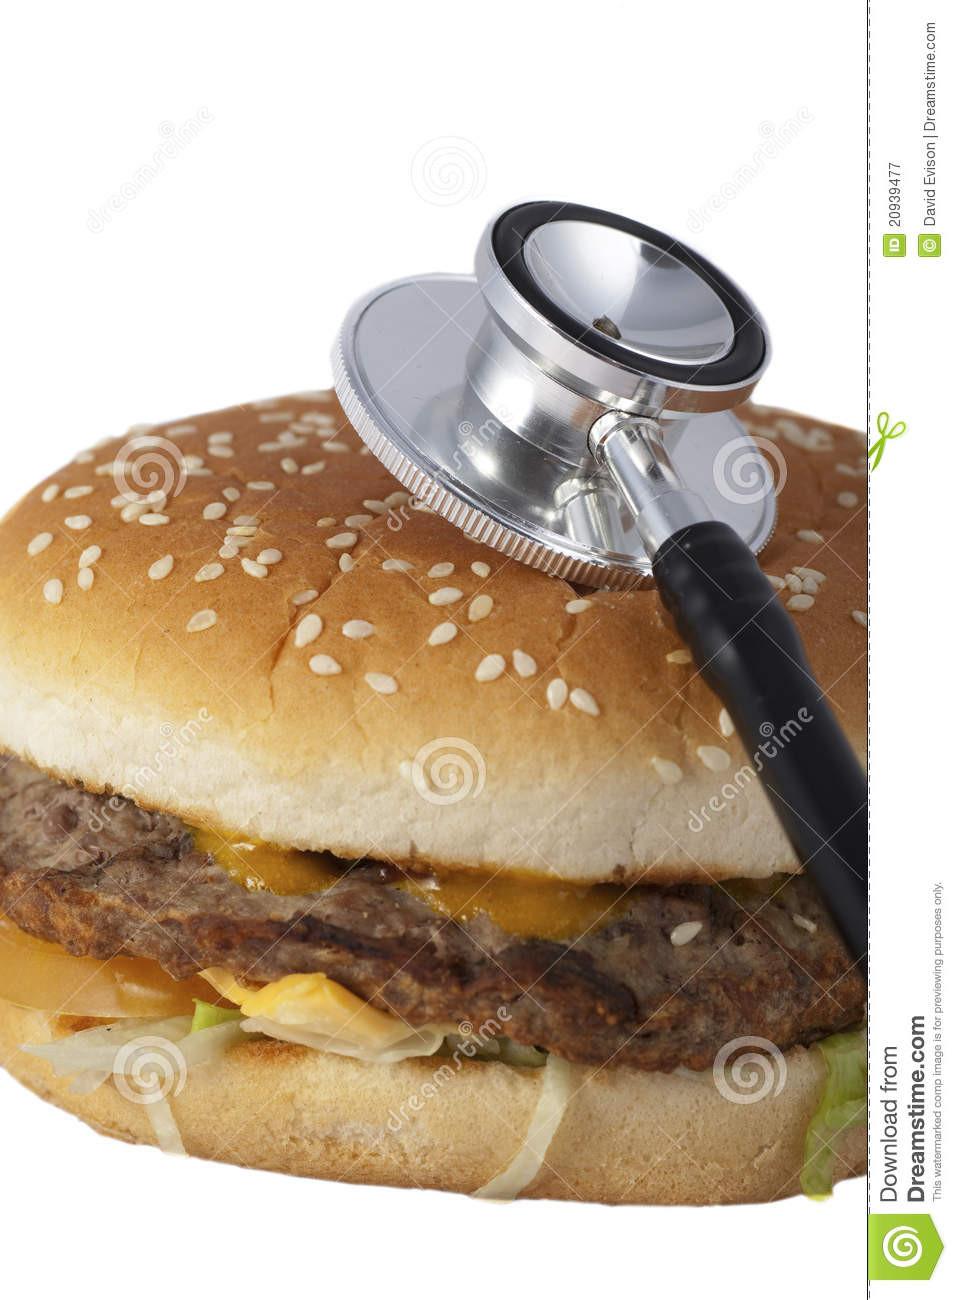 Are Hamburgers Unhealthy  Unhealthy Fast Food Burger Stock Image Image